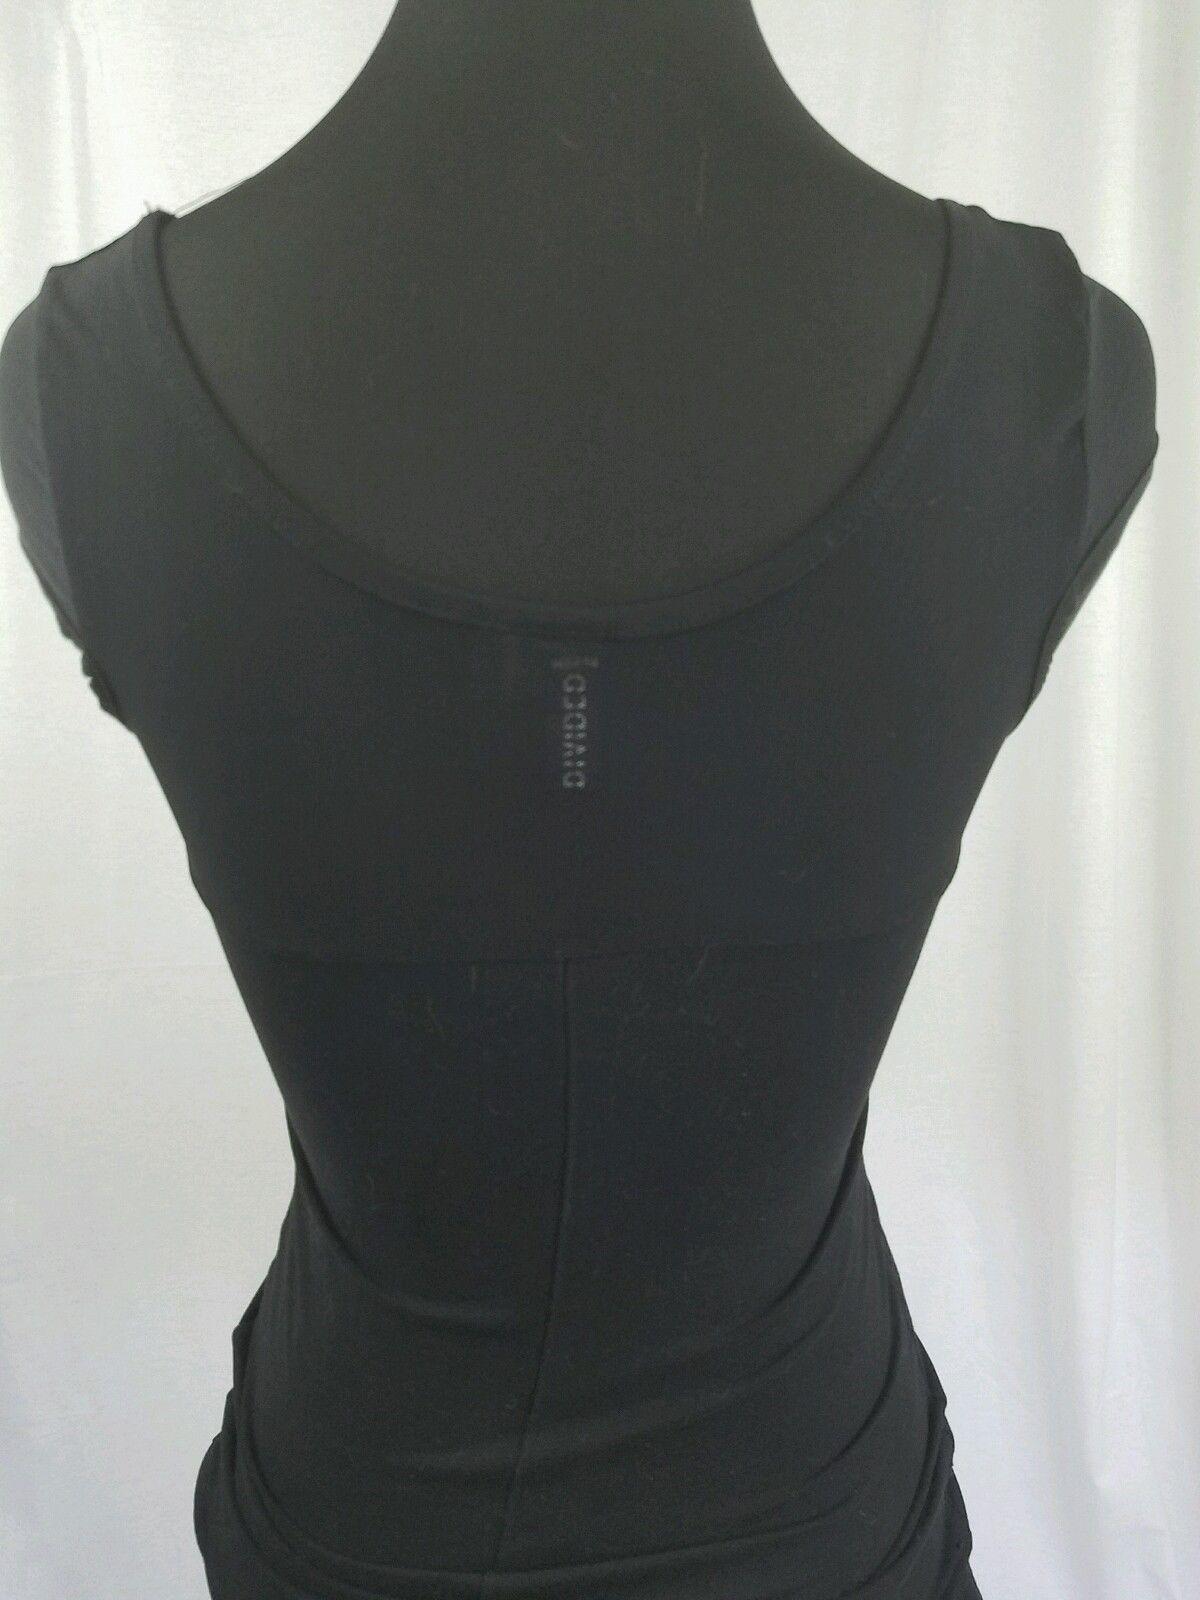 H&M Little Black Dress Sweetheart Neckline Mesh Sleeve Sexy Size 4